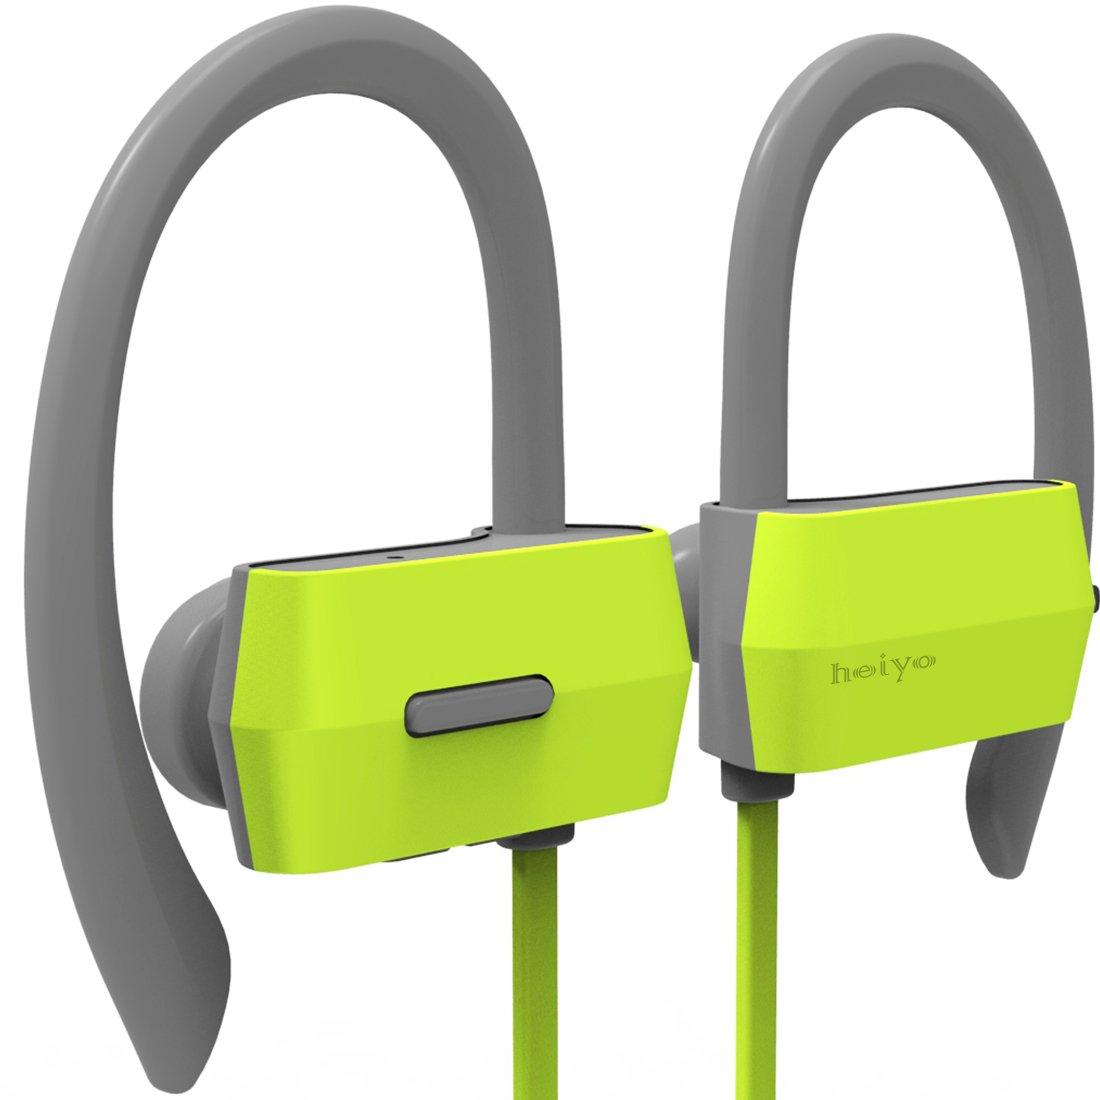 Heiyo Wireless Sport Bluetooth Headphones, In-Ear Fit: Amazon.co.uk:  Electronics